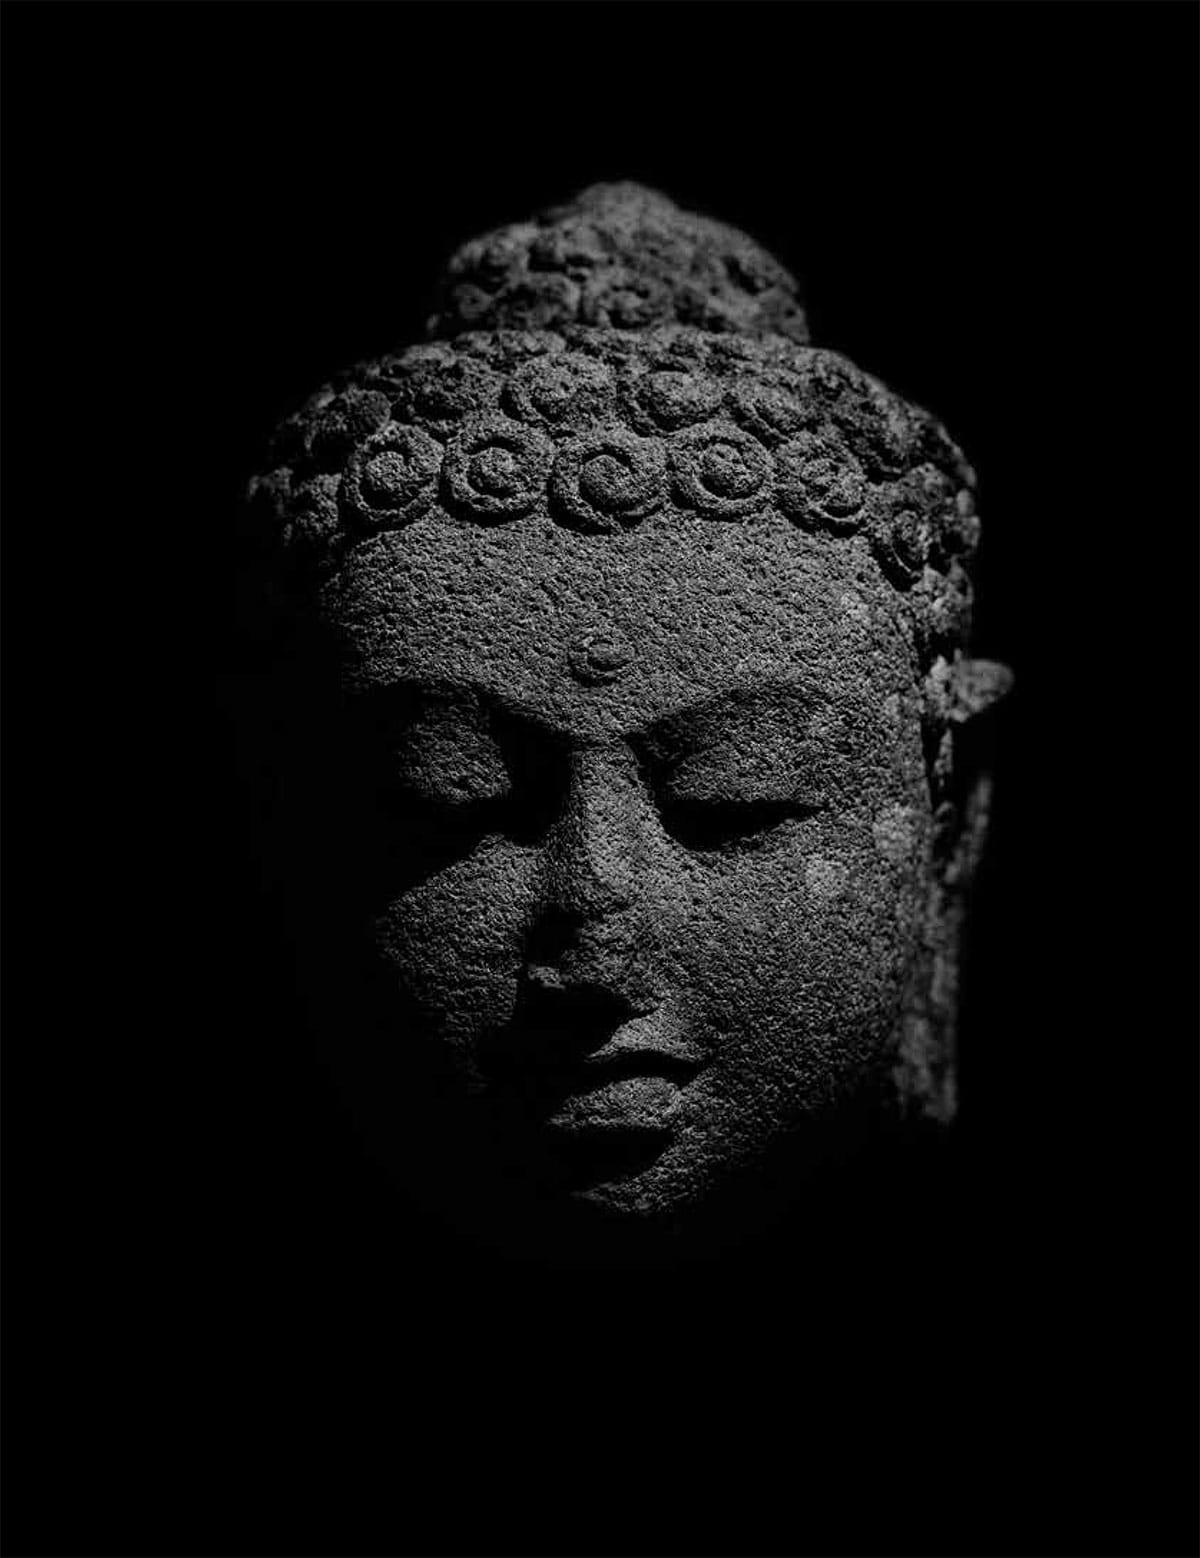 Buddha Satipatthana Sutta Joseph Goldstein Buddhadharma Mindfulness Lion's Roar BUddhism